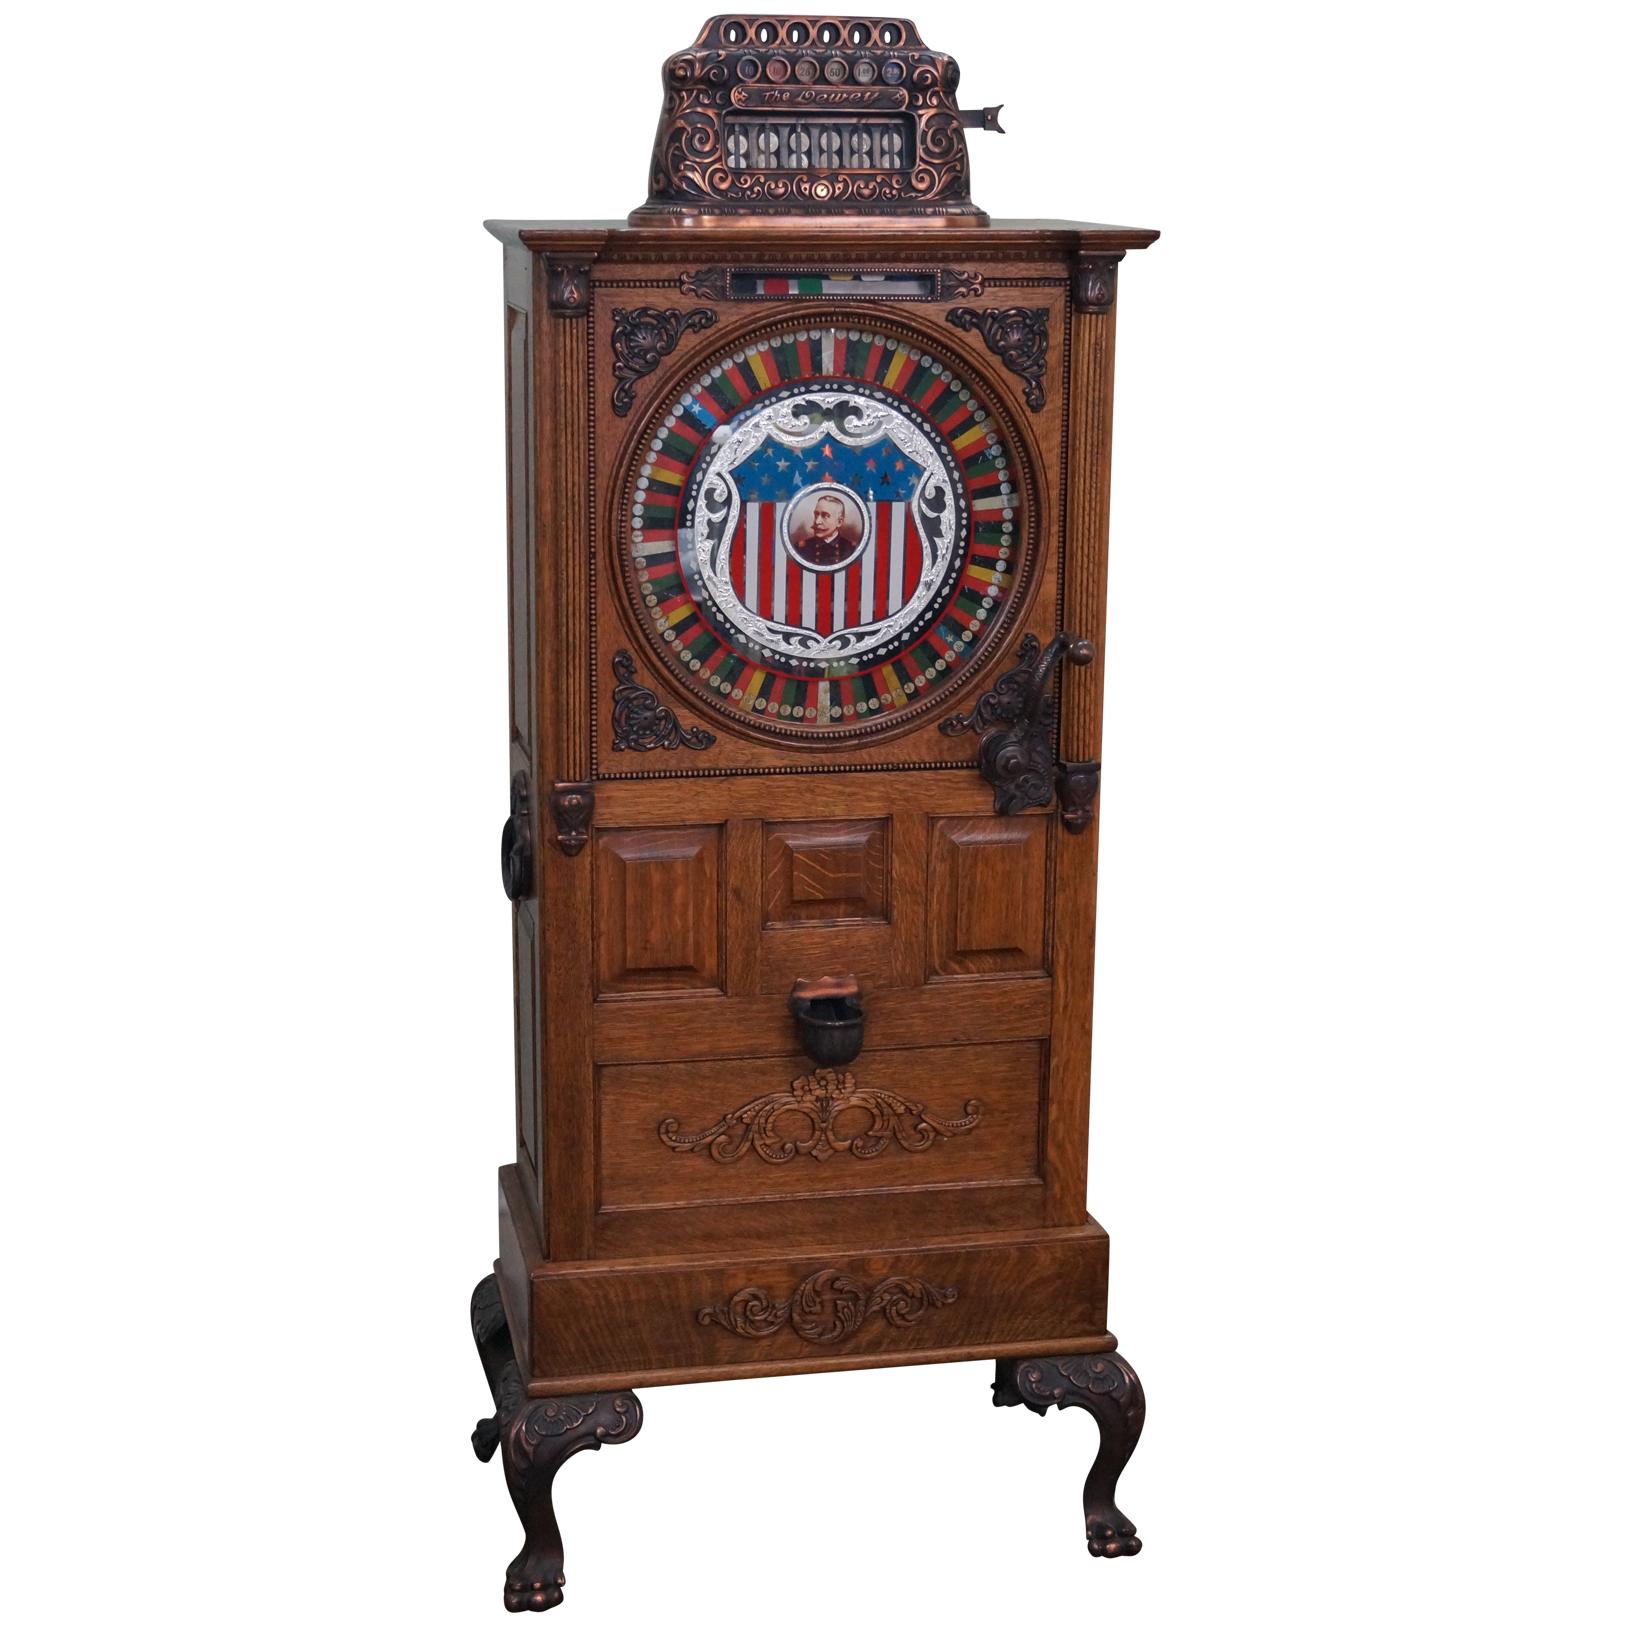 upright slot machine